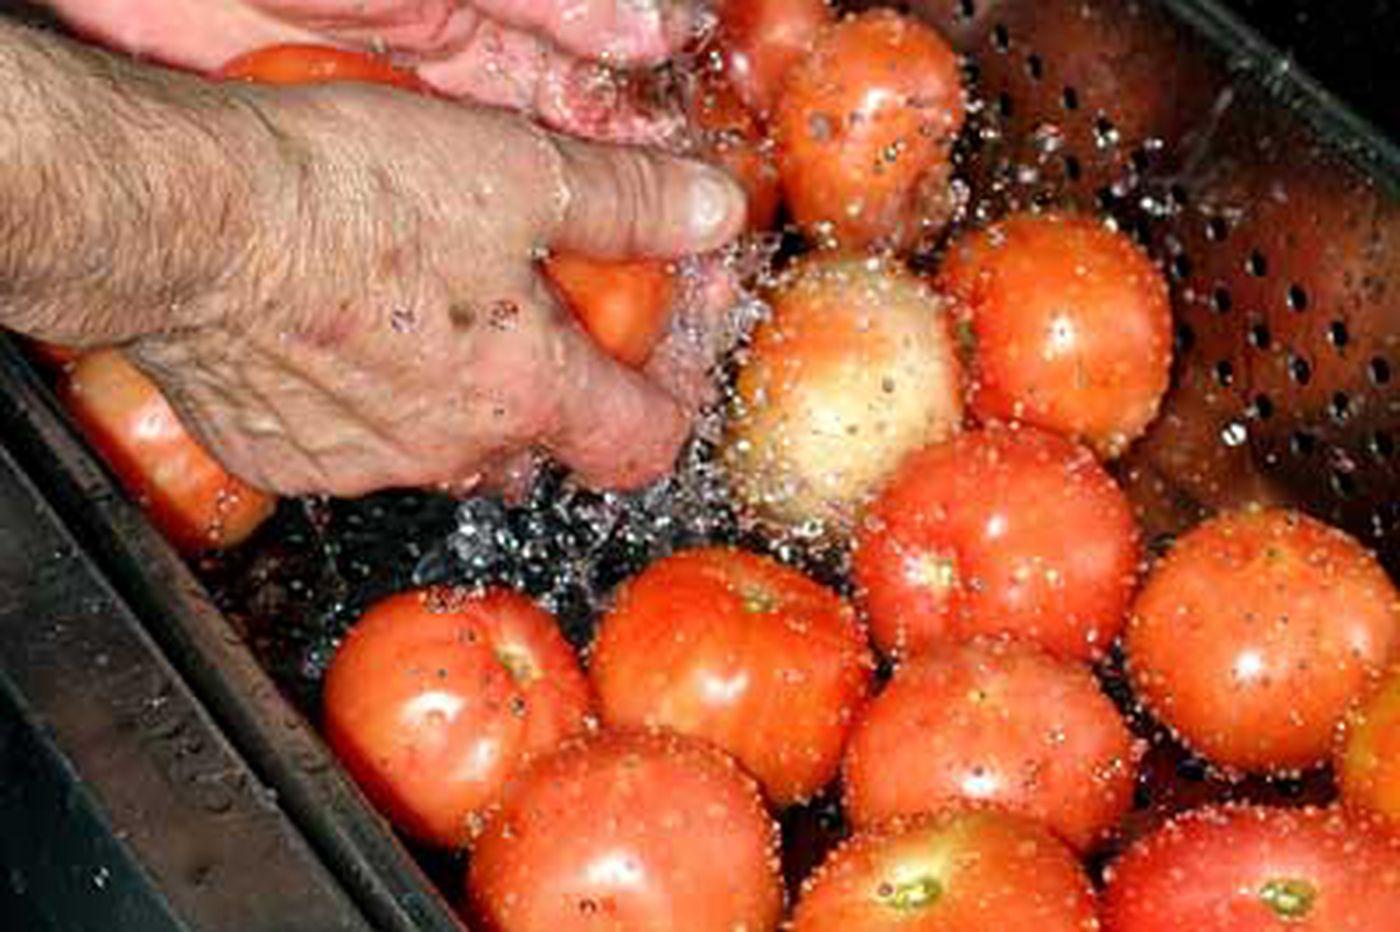 McDonald's pulls sliced tomatoes amid fears